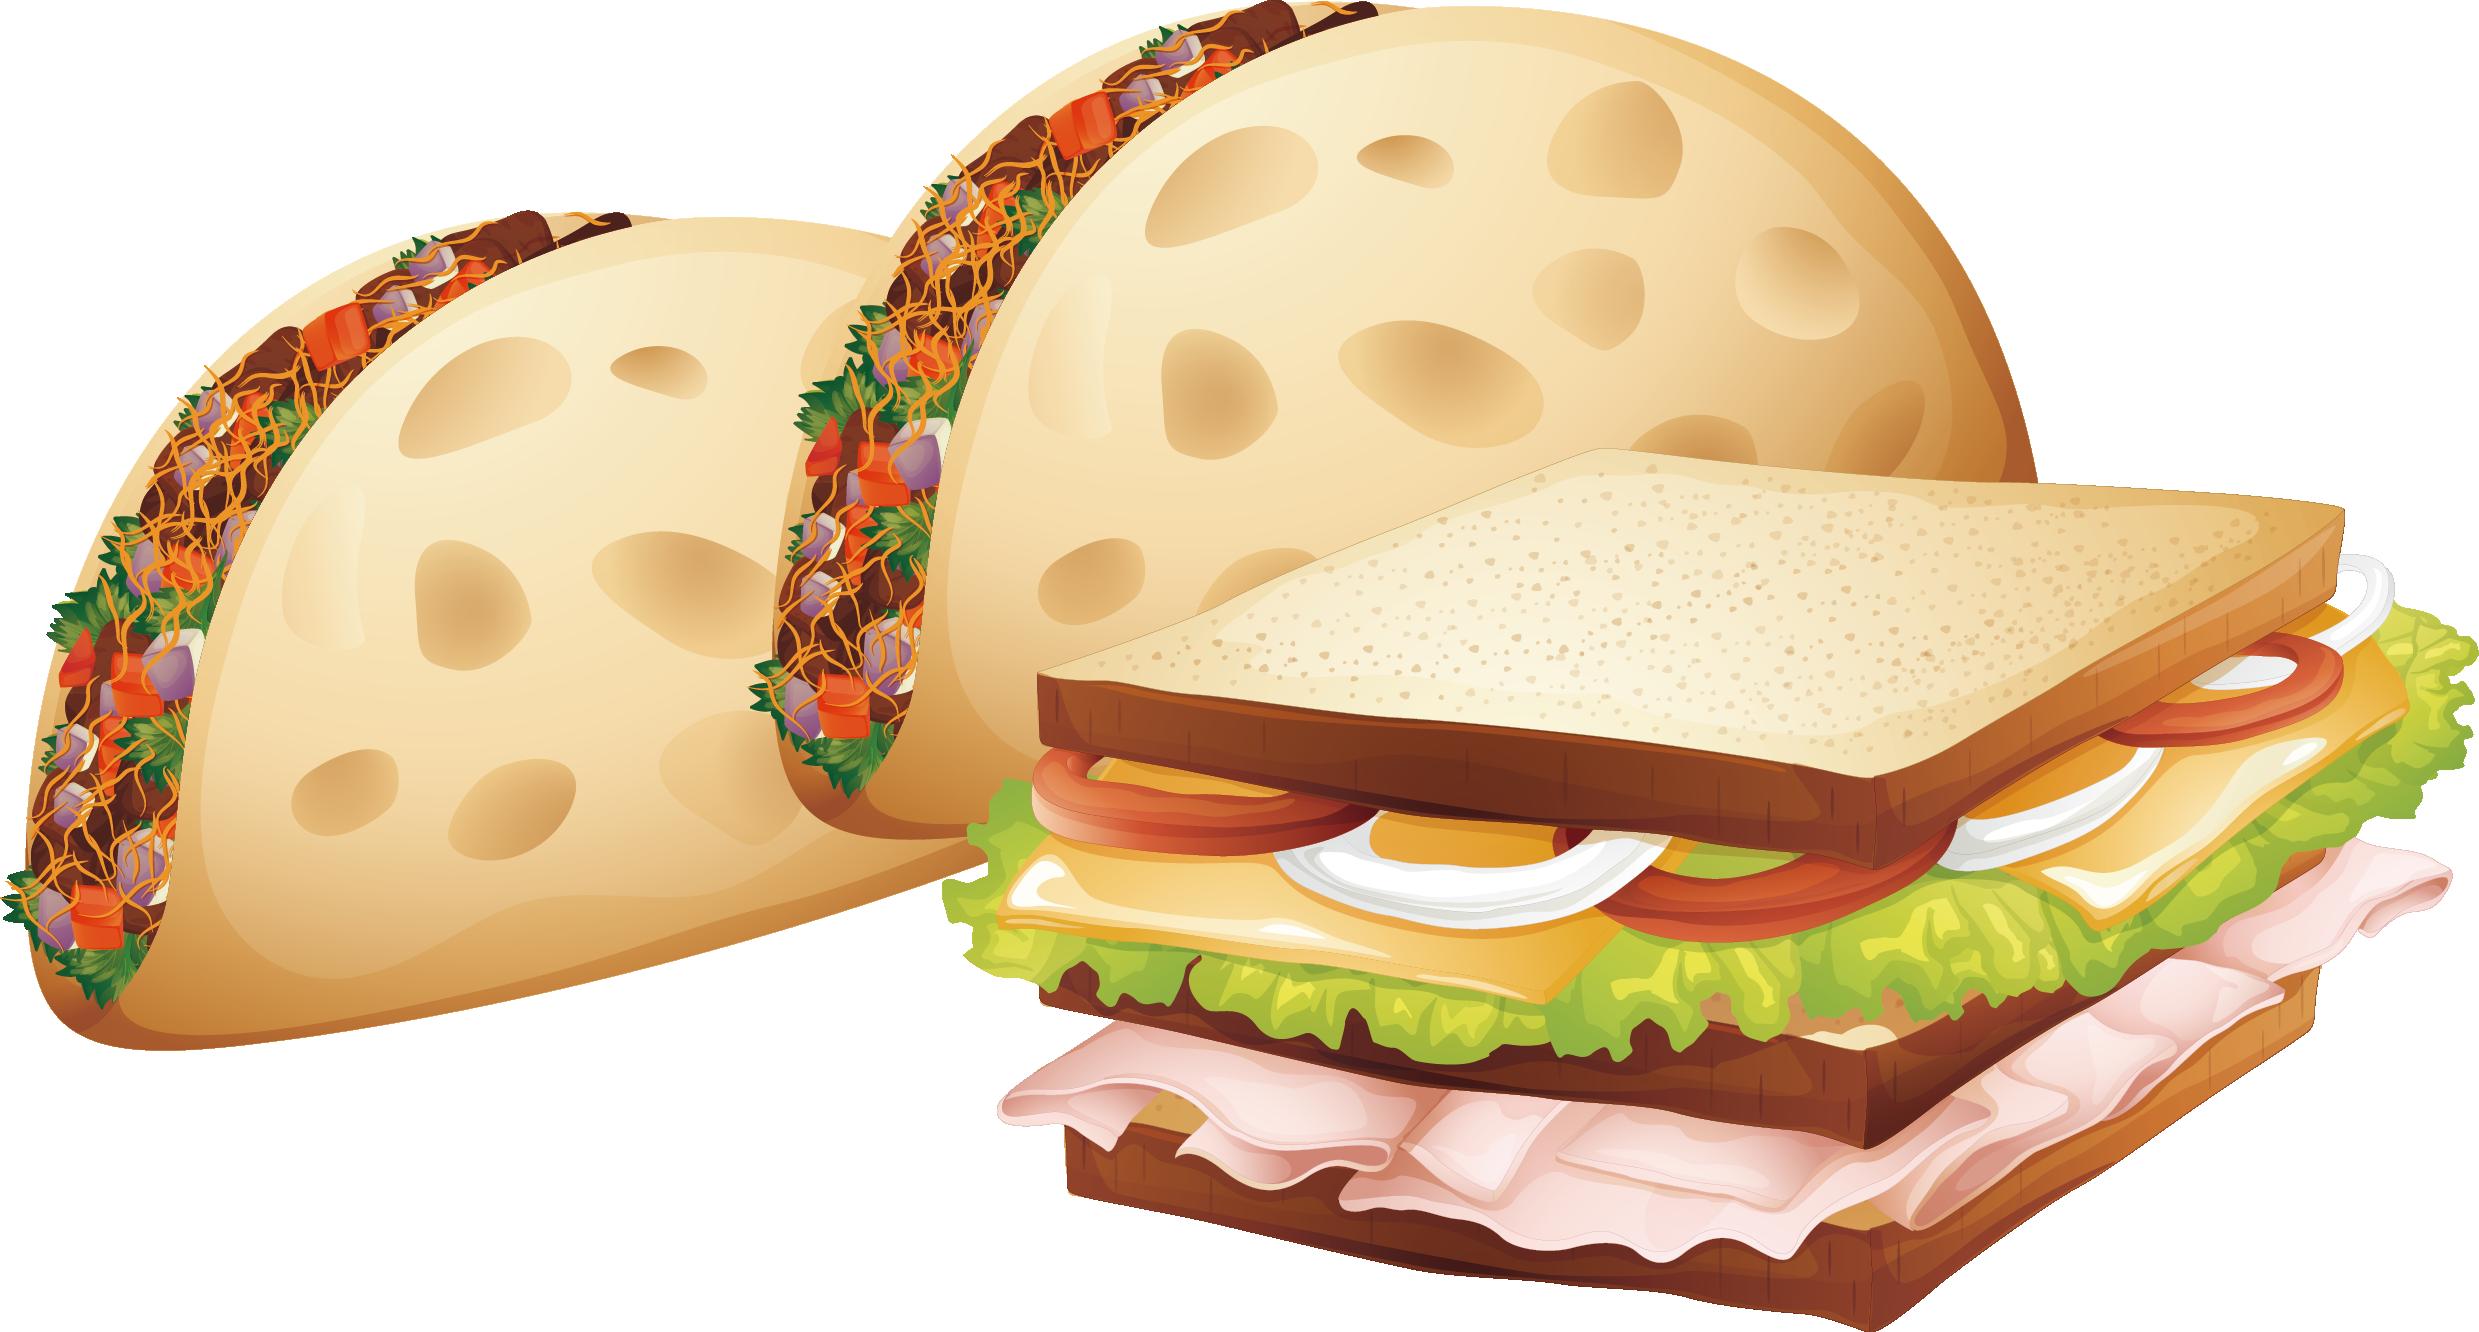 Fries clipart breakfast. Chicken nugget hamburger french